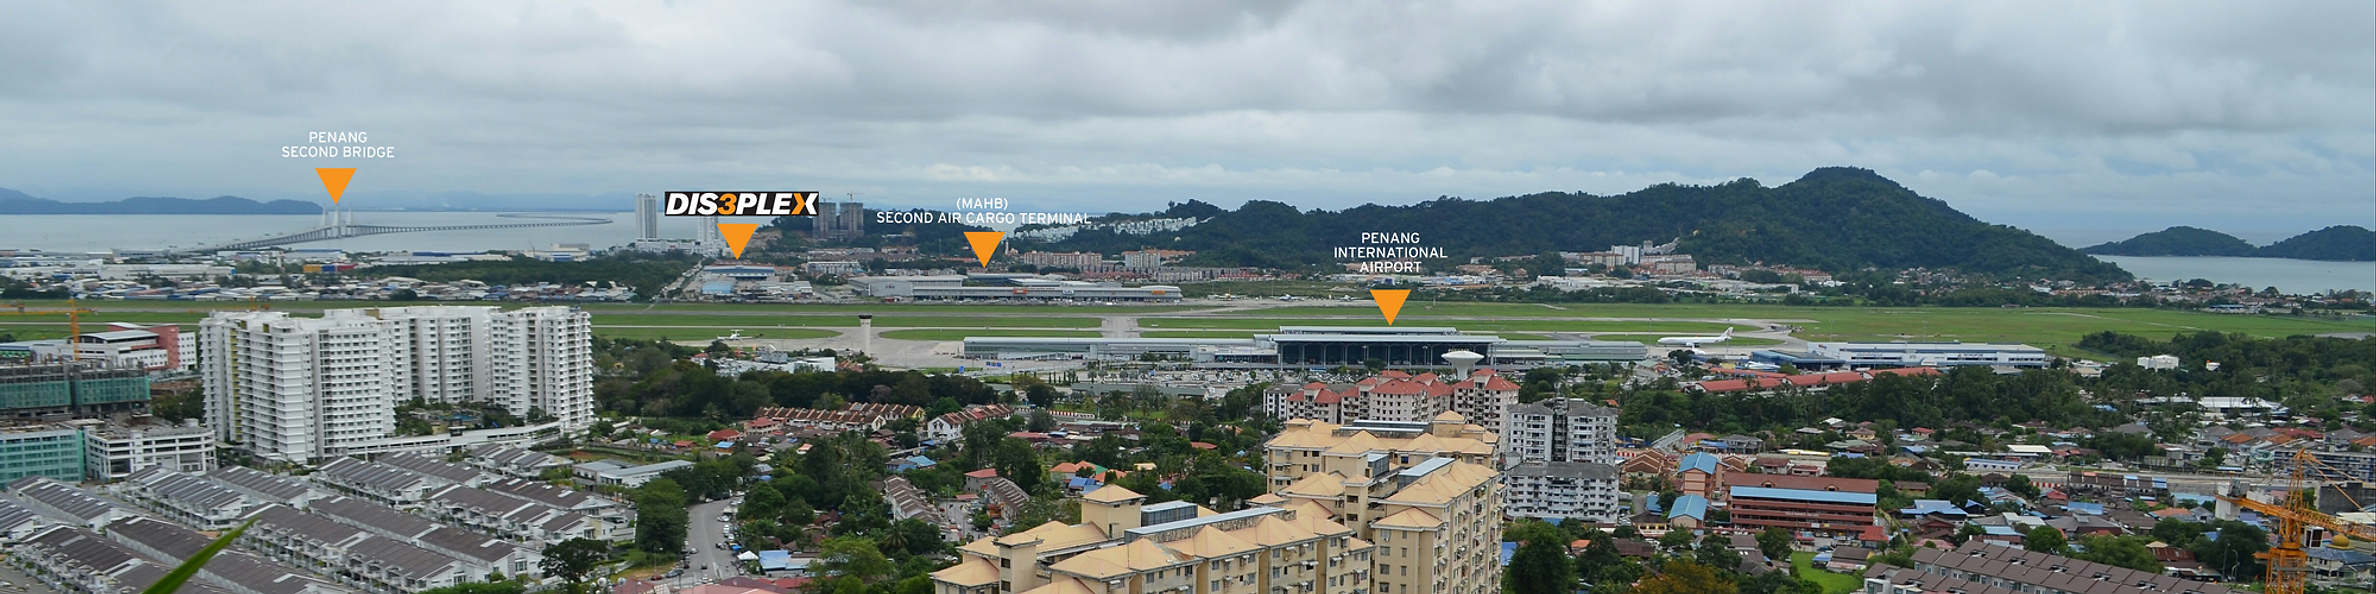 Cmglee_Penang_airport_and_second_bridge